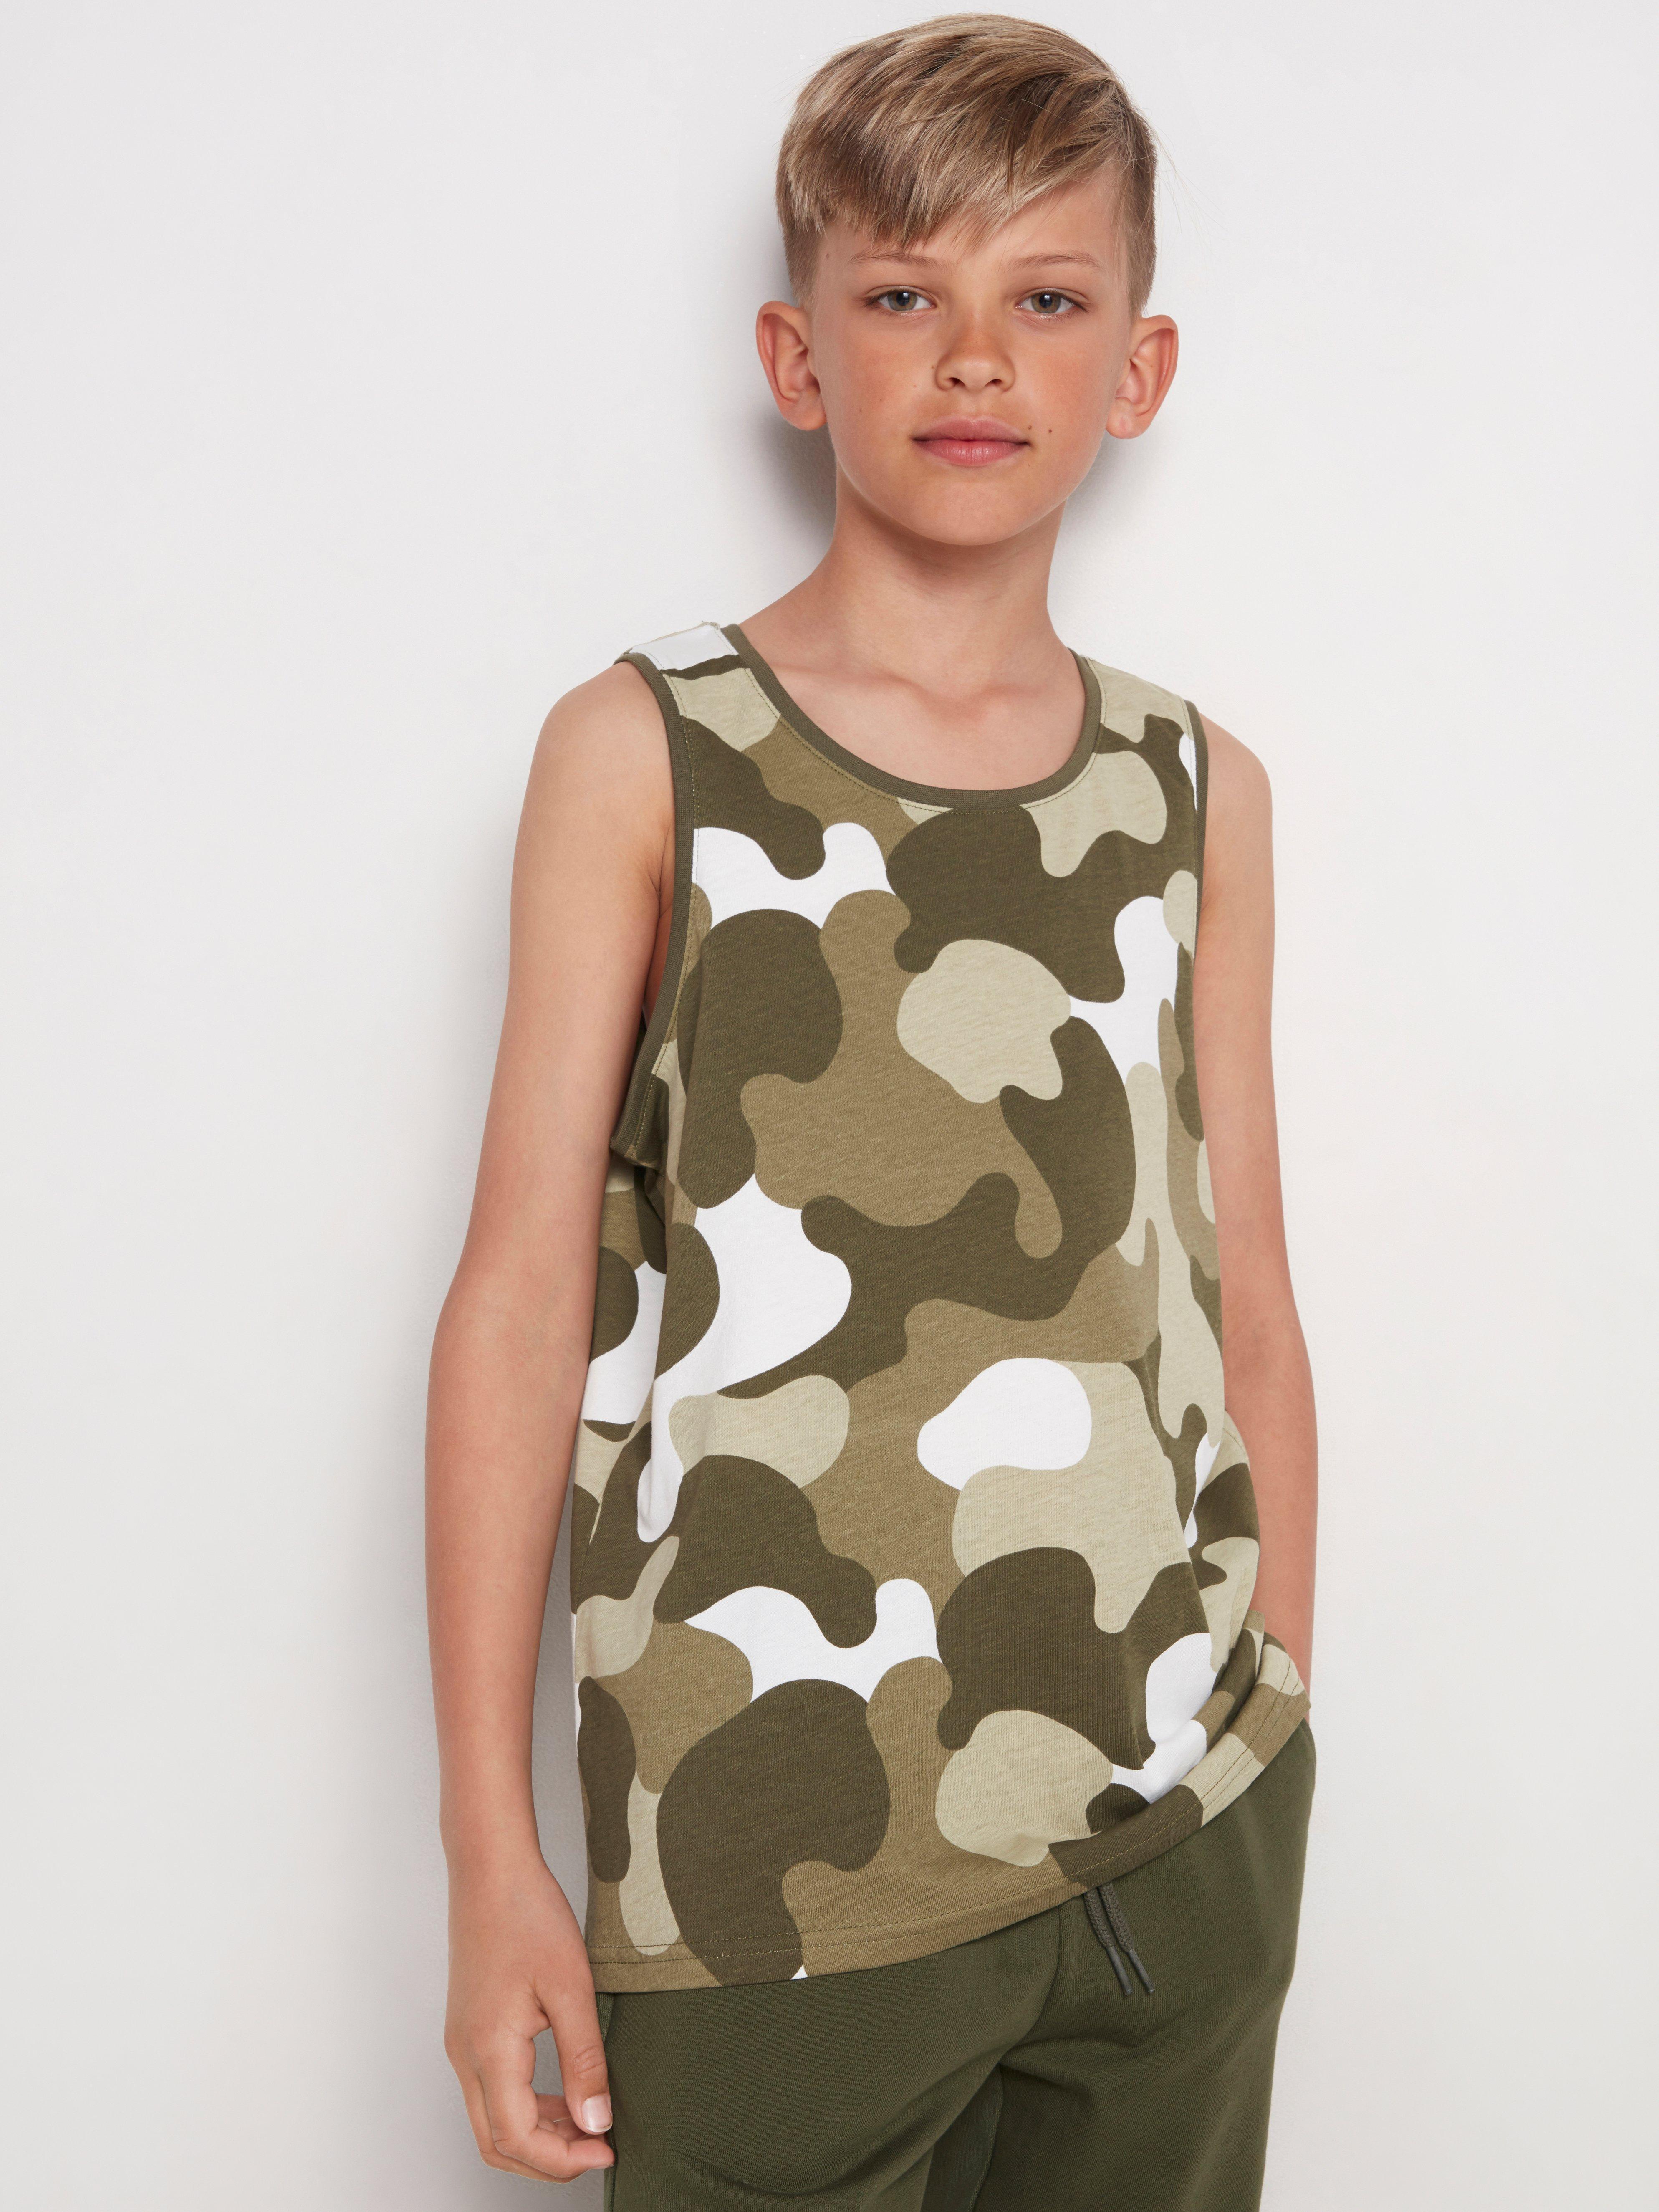 Linne med camouflagemönster